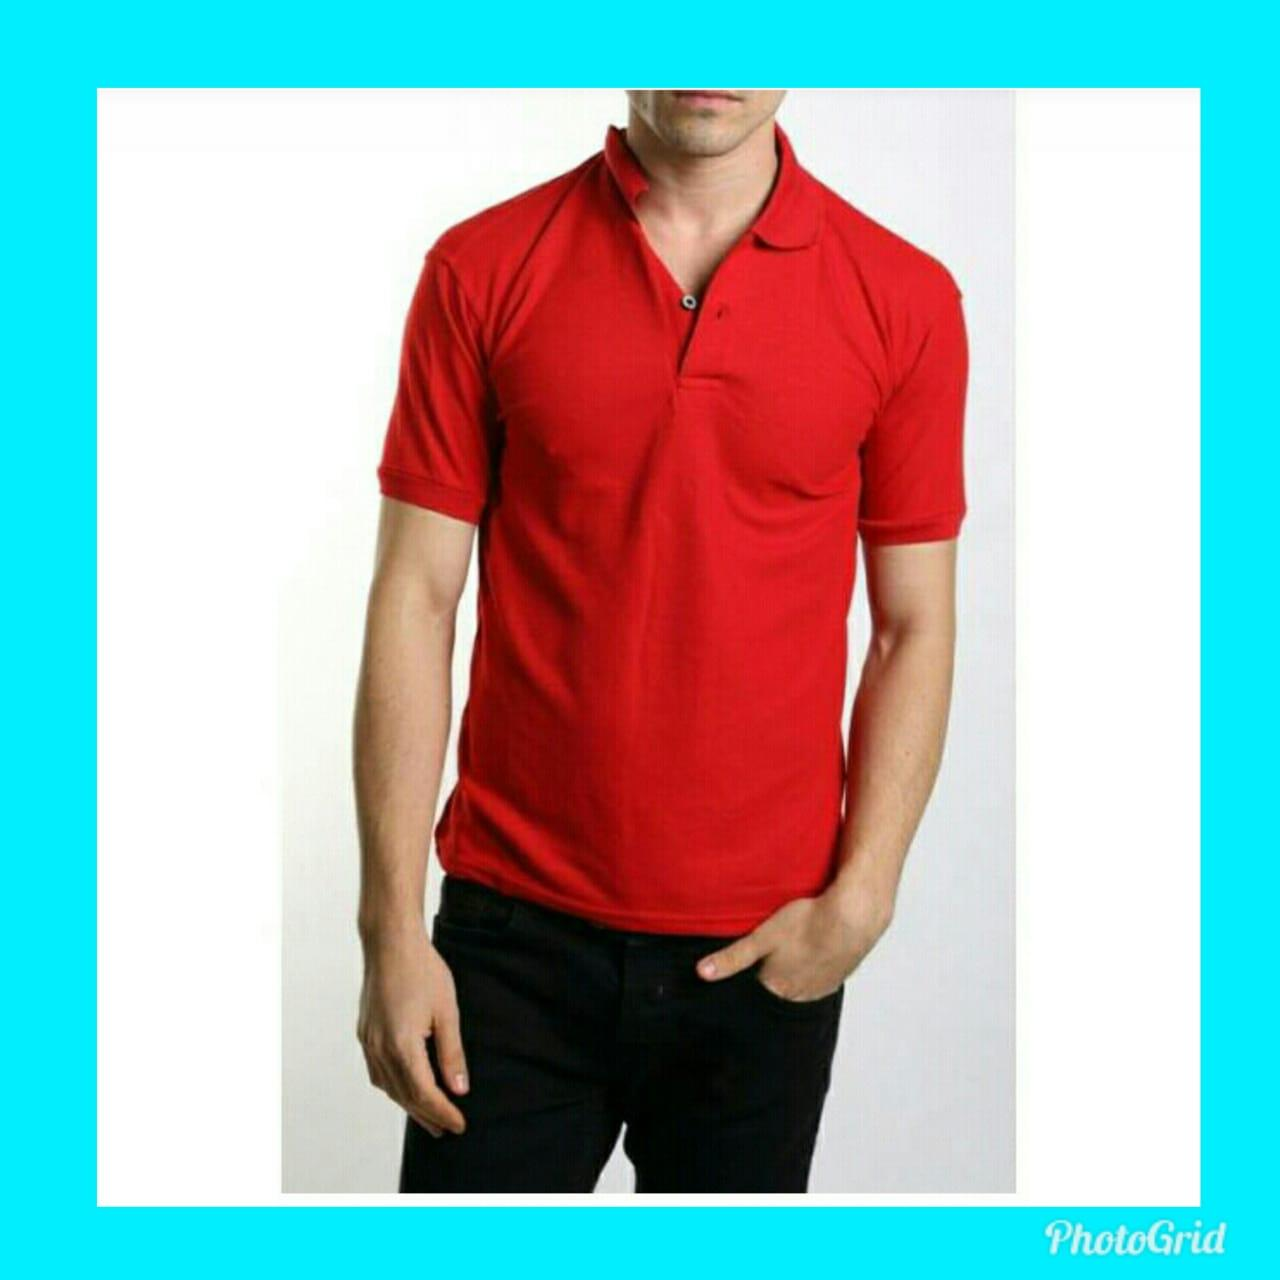 Buy Sell Cheapest Modis Kaos Pria Best Quality Product Deals Polo T Shirt Distro Hrcn H 0246 Kerah Lengan Pendek Atsan Nyaman Trendy